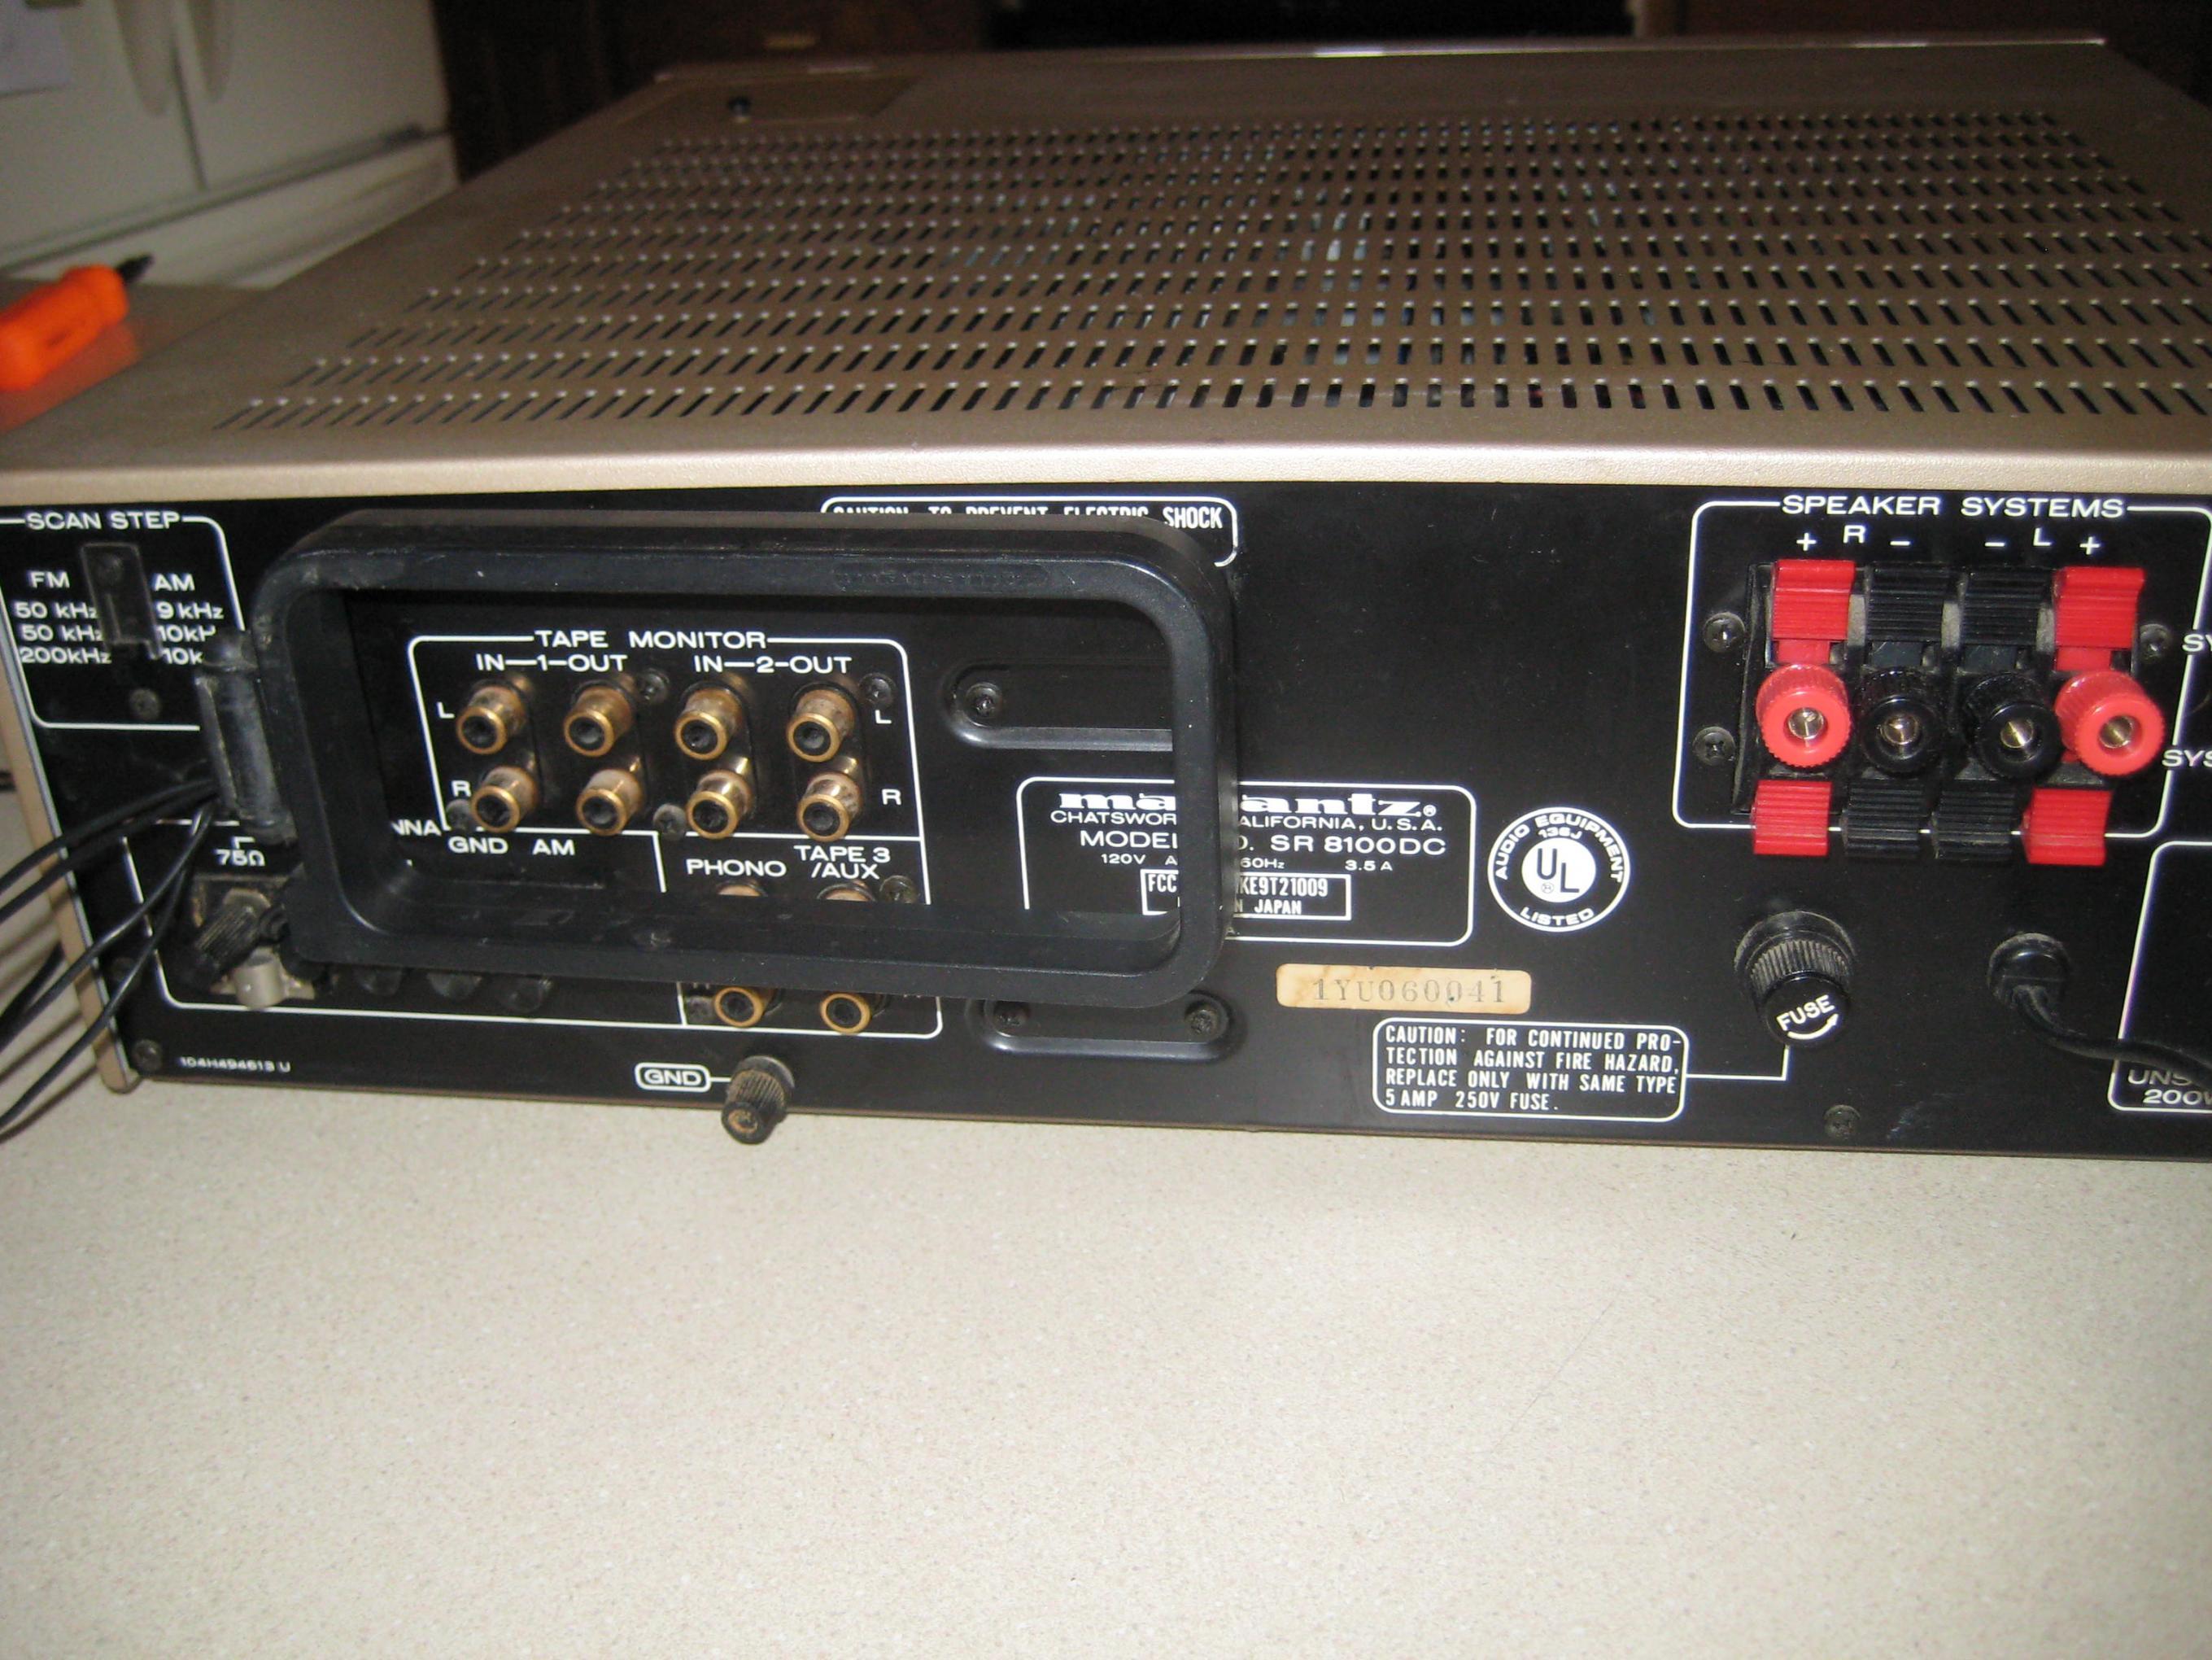 Very Nice Marantz Sr 8100dc 70w Ch Gold Series 1981 Polk Audio Fm Amplifier 014 5319k